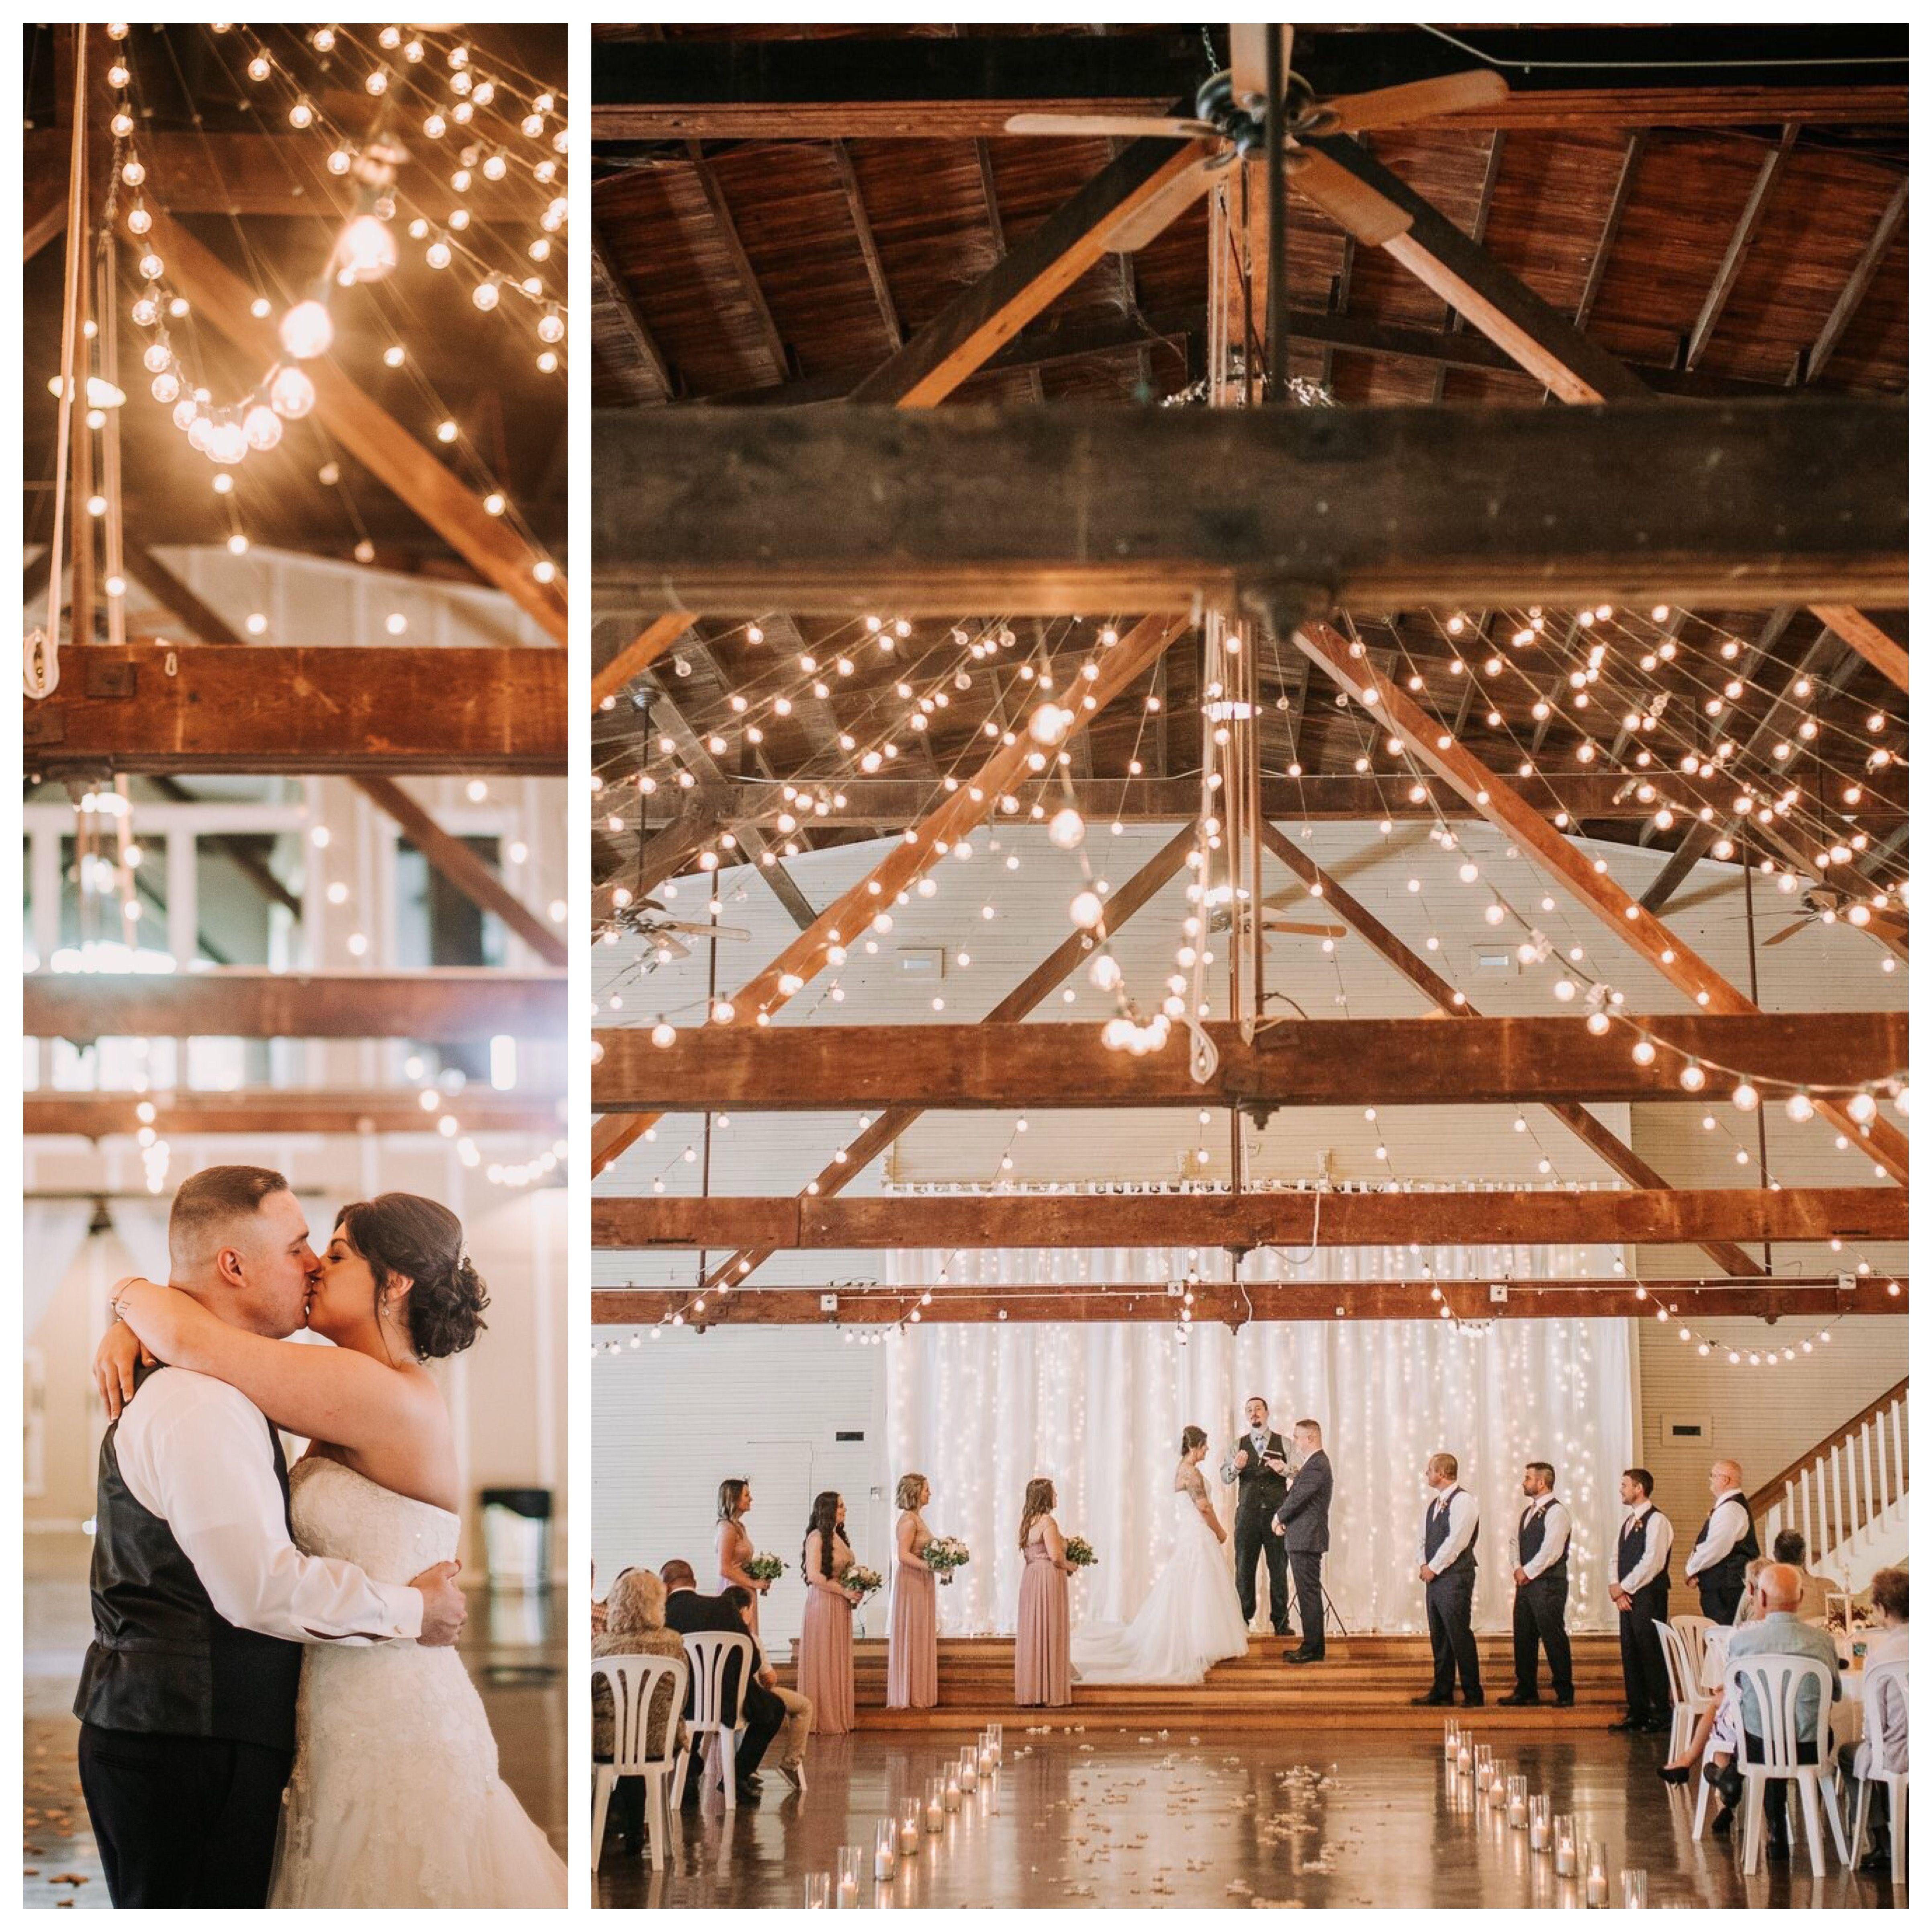 Indoor Barn Wedding Green Villa Barn Independence Oregon Light Strings Reception Wedding Venues Oregon Portland Oregon Wedding Oregon Wedding